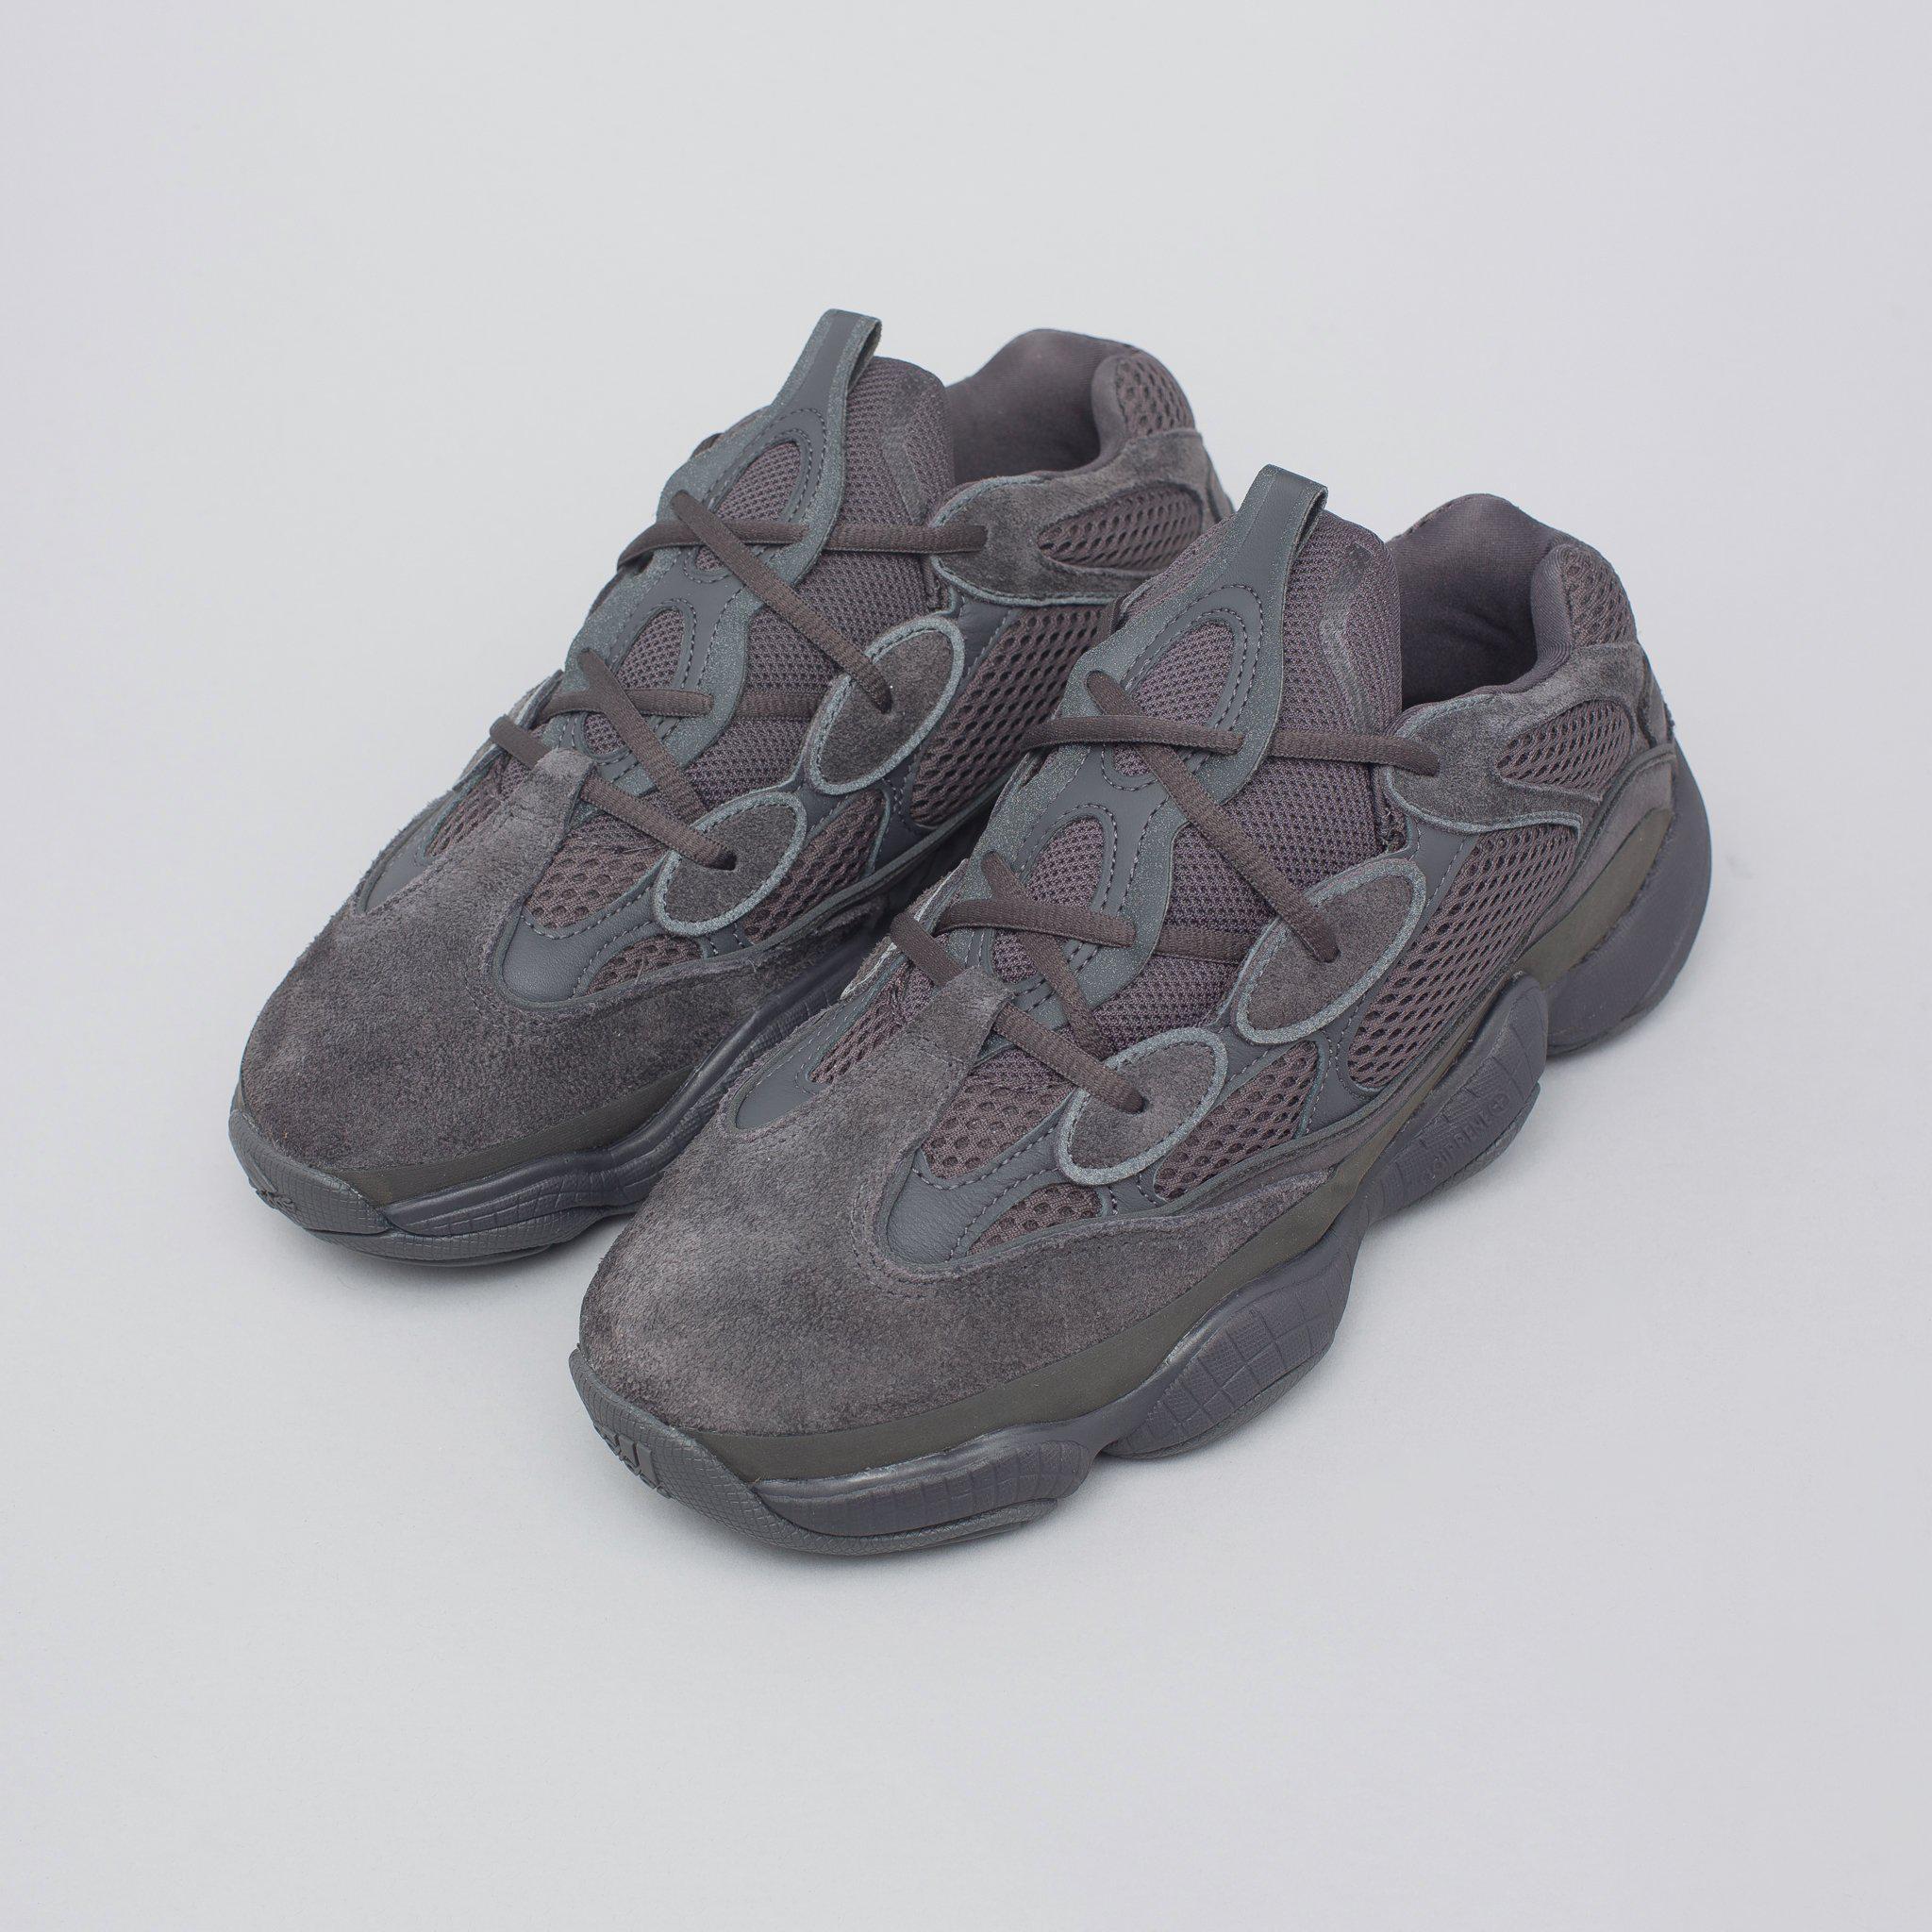 31bbbb005 Lyst - adidas Yeezy 500 In Black in Black for Men